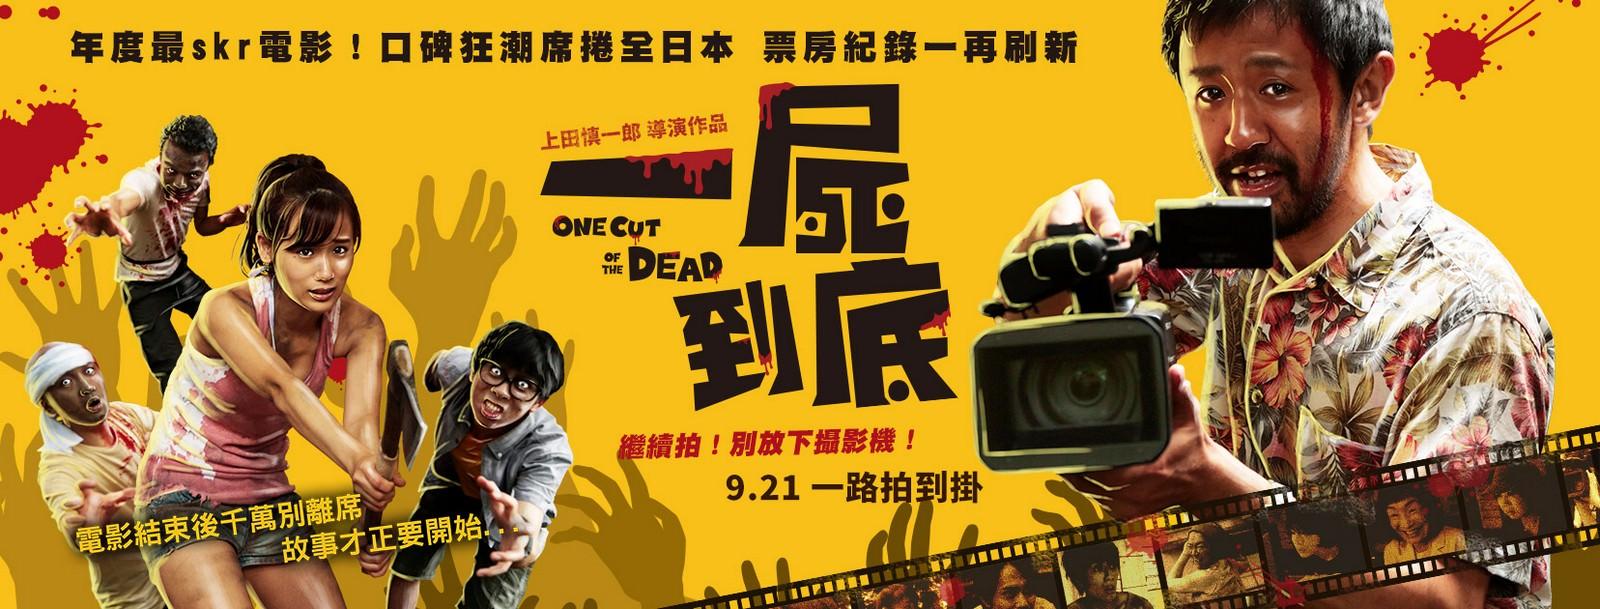 Movie, カメラを止めるな!(日本, 2017) / 一屍到底(台) / 屍殺片場(港) / One Cut of the Dead(英文) / 摄影机不要停!(網), 電影海報, 台灣, 橫版